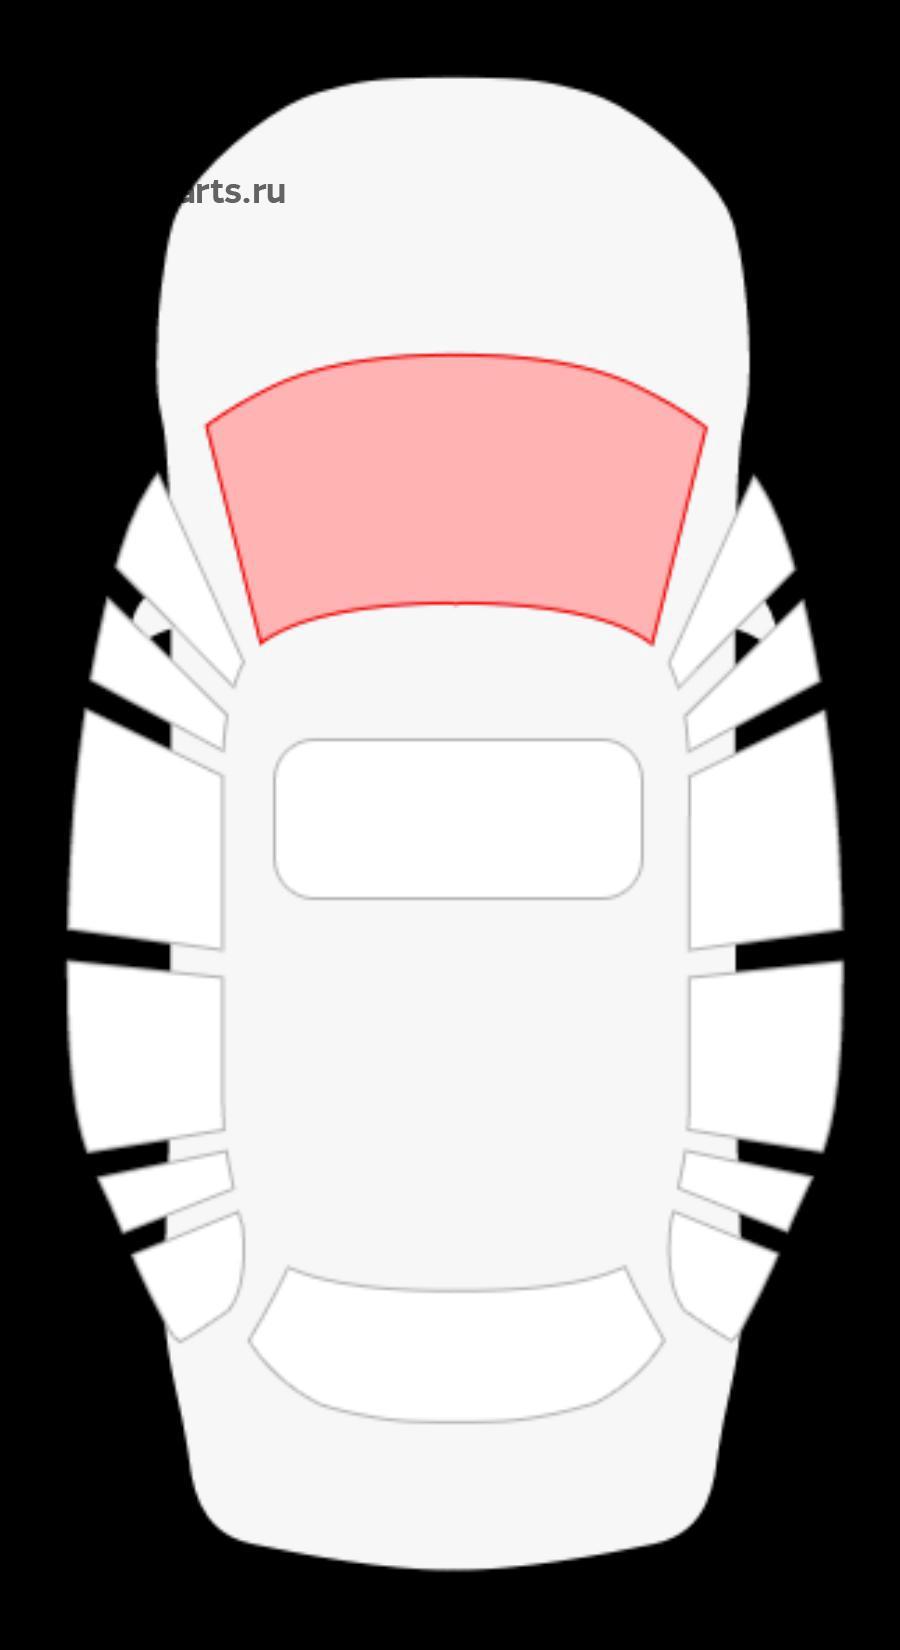 Toyota Passo II 5D Hbk / Daihatsu Boon 5D Hbk / Sirion 5D Hbk (без полосы)